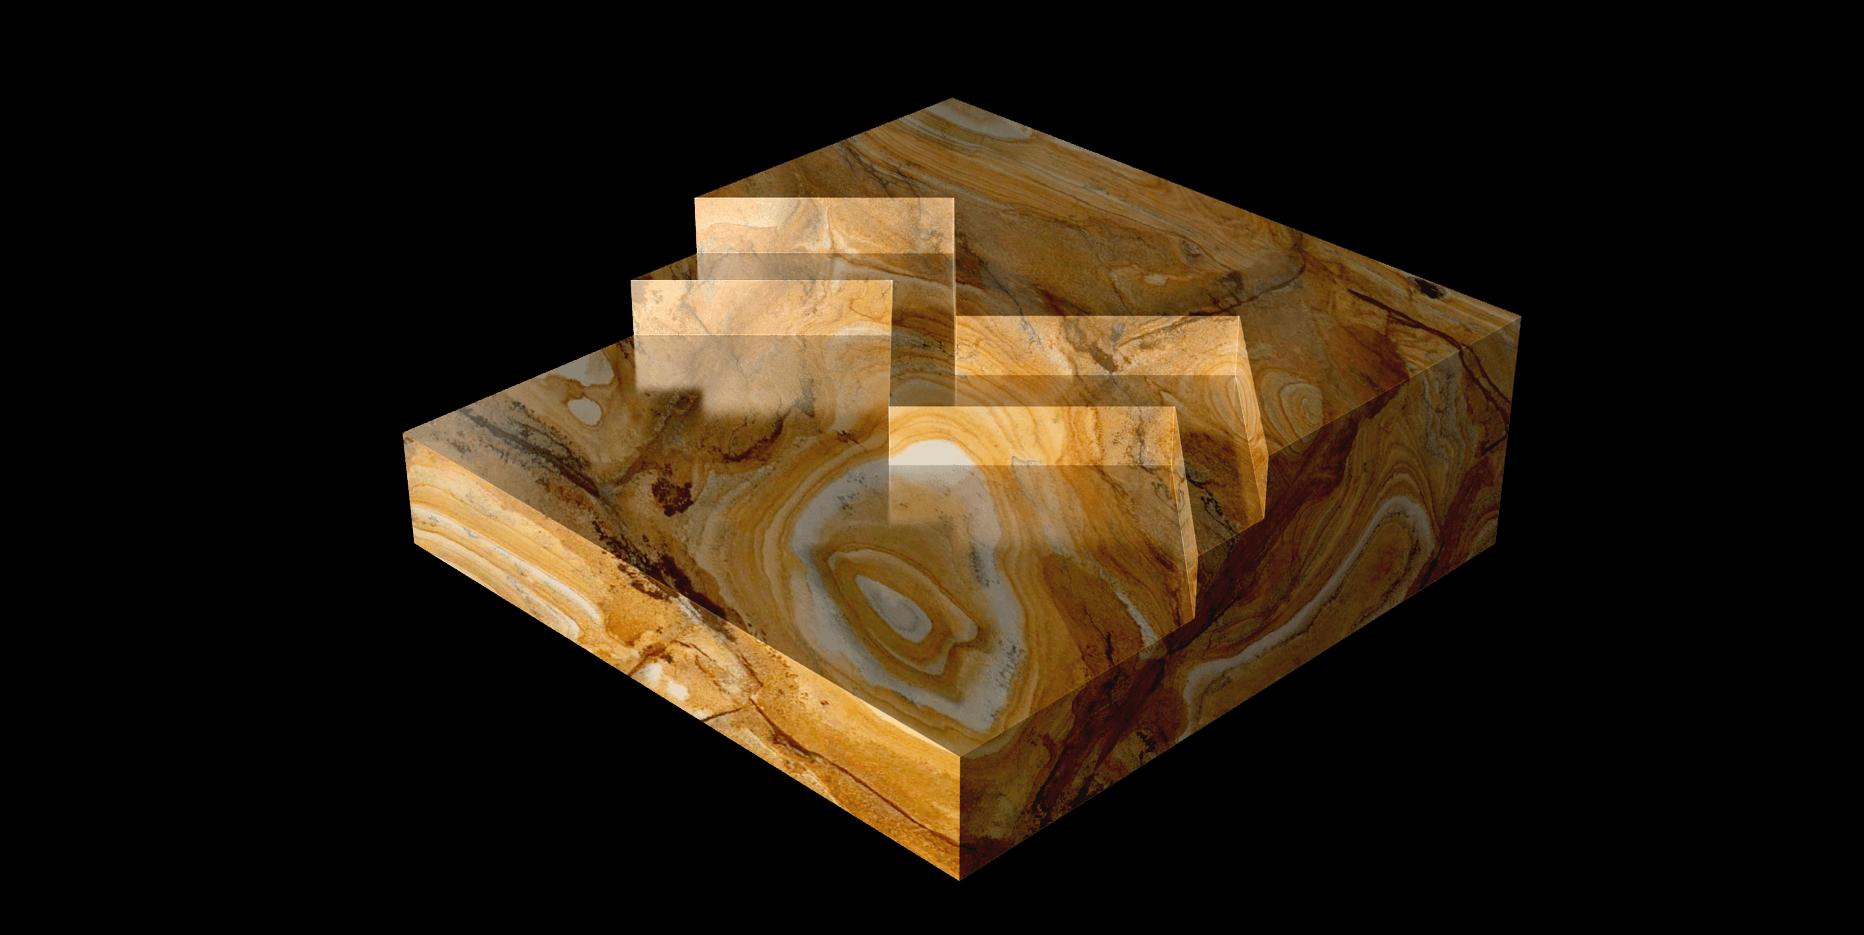 Palomino фото 2 — камень от Bevers Marmyr